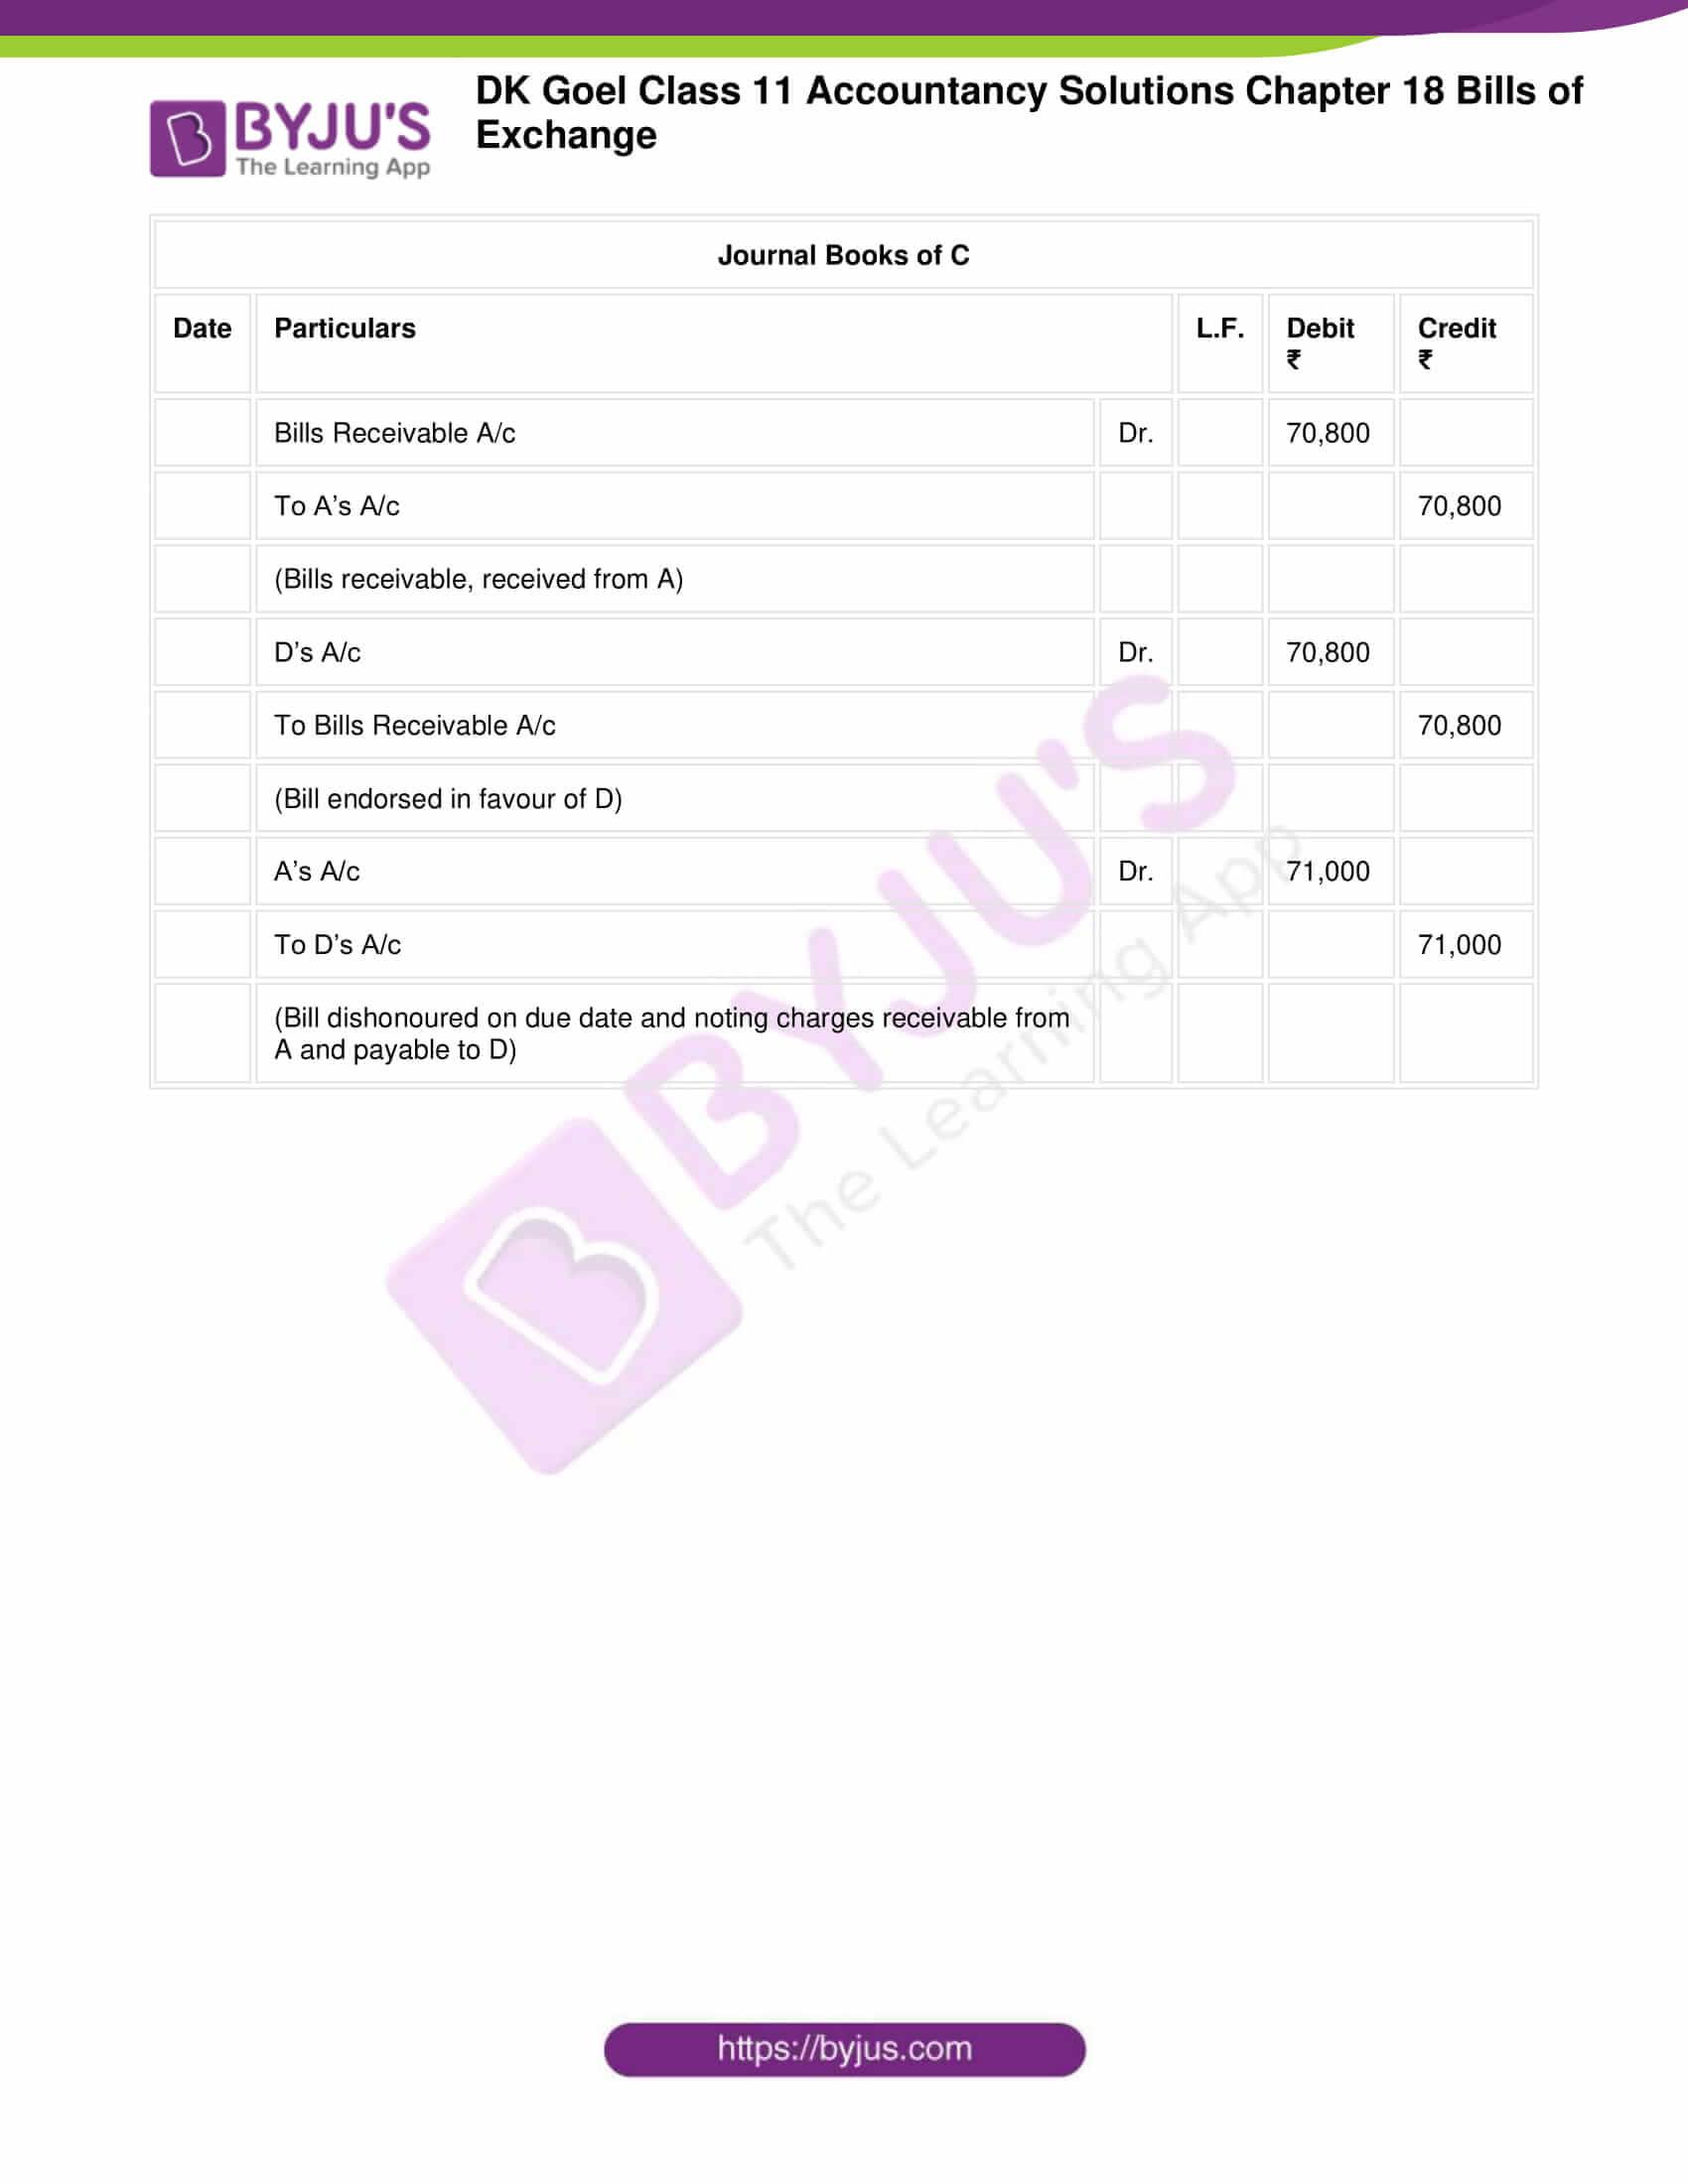 dk goel class 11 accountancy solutions chapter 18 071